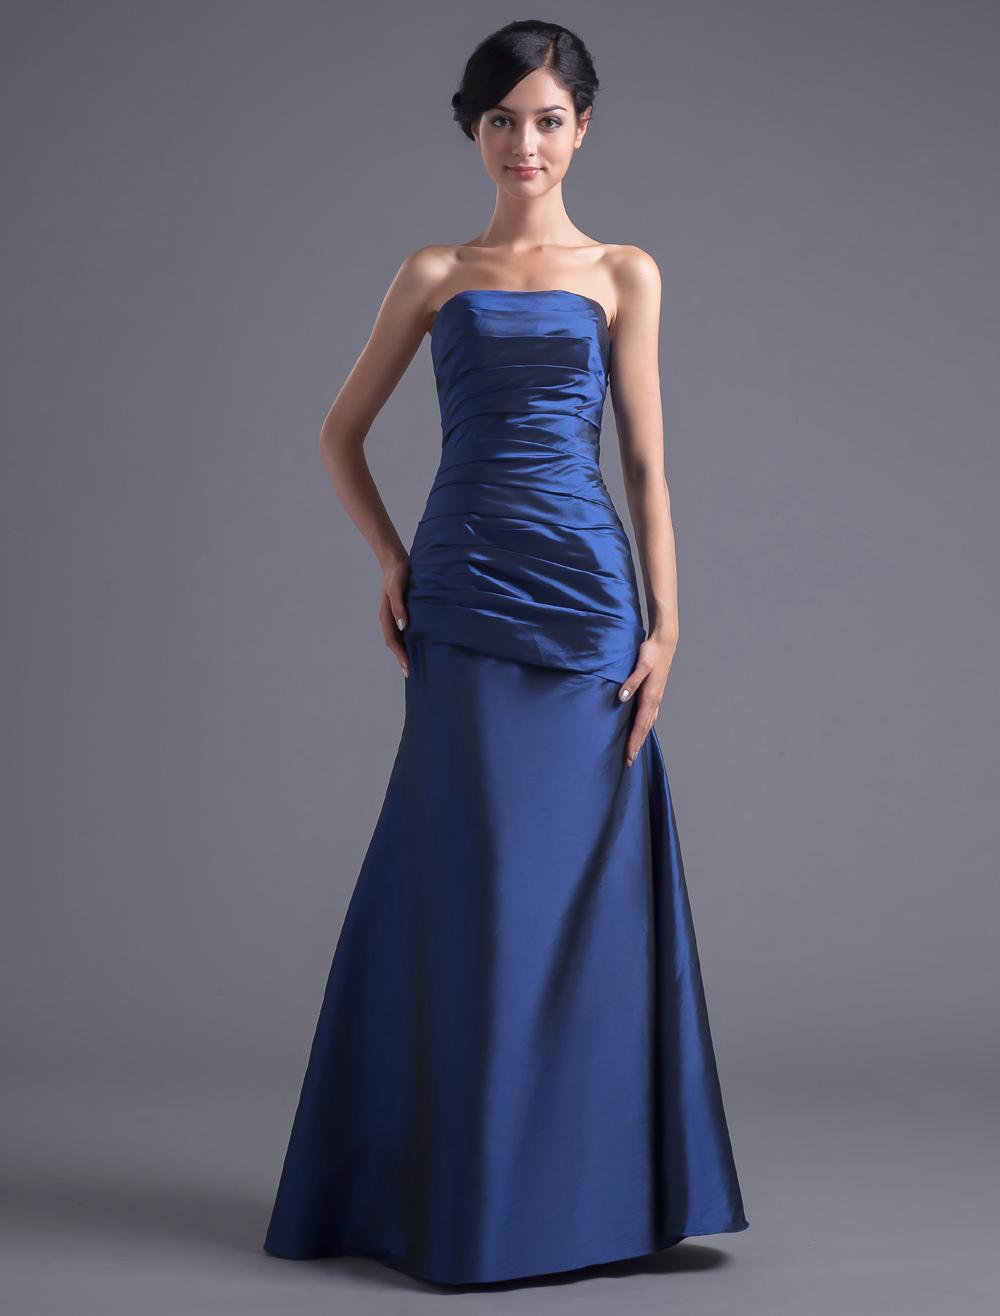 Royal Blue Strapless Bridesmaid Dress